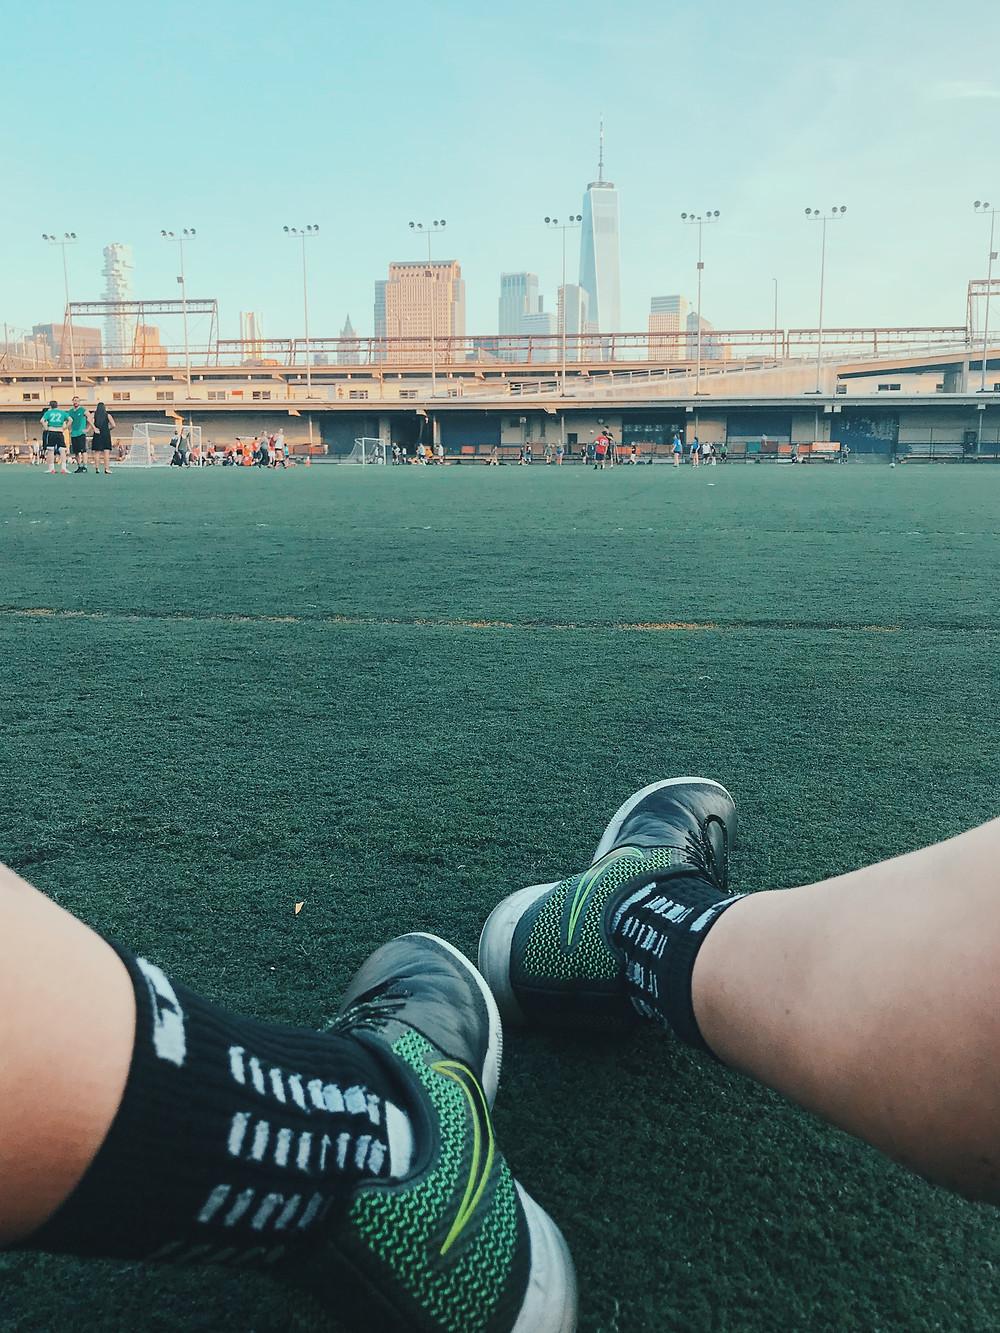 turf Soccer field in New York City Pier 40